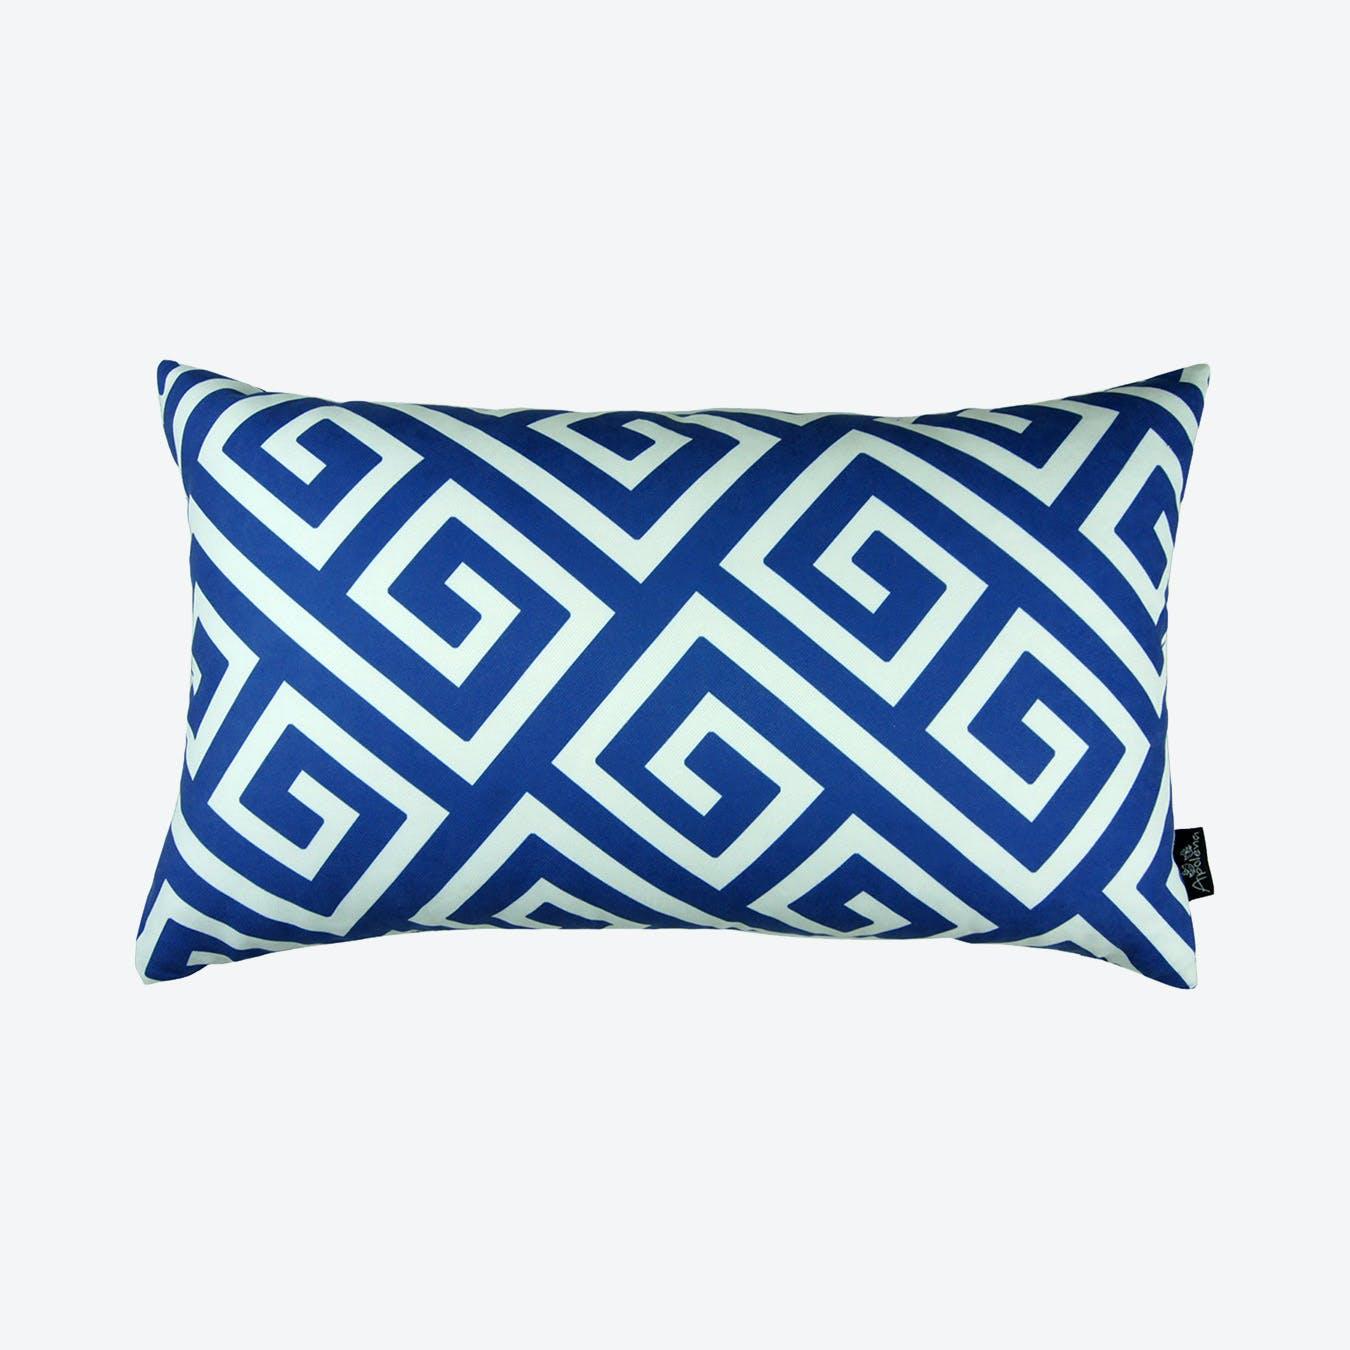 greek key decorative lumbar throw pillow cover blue white